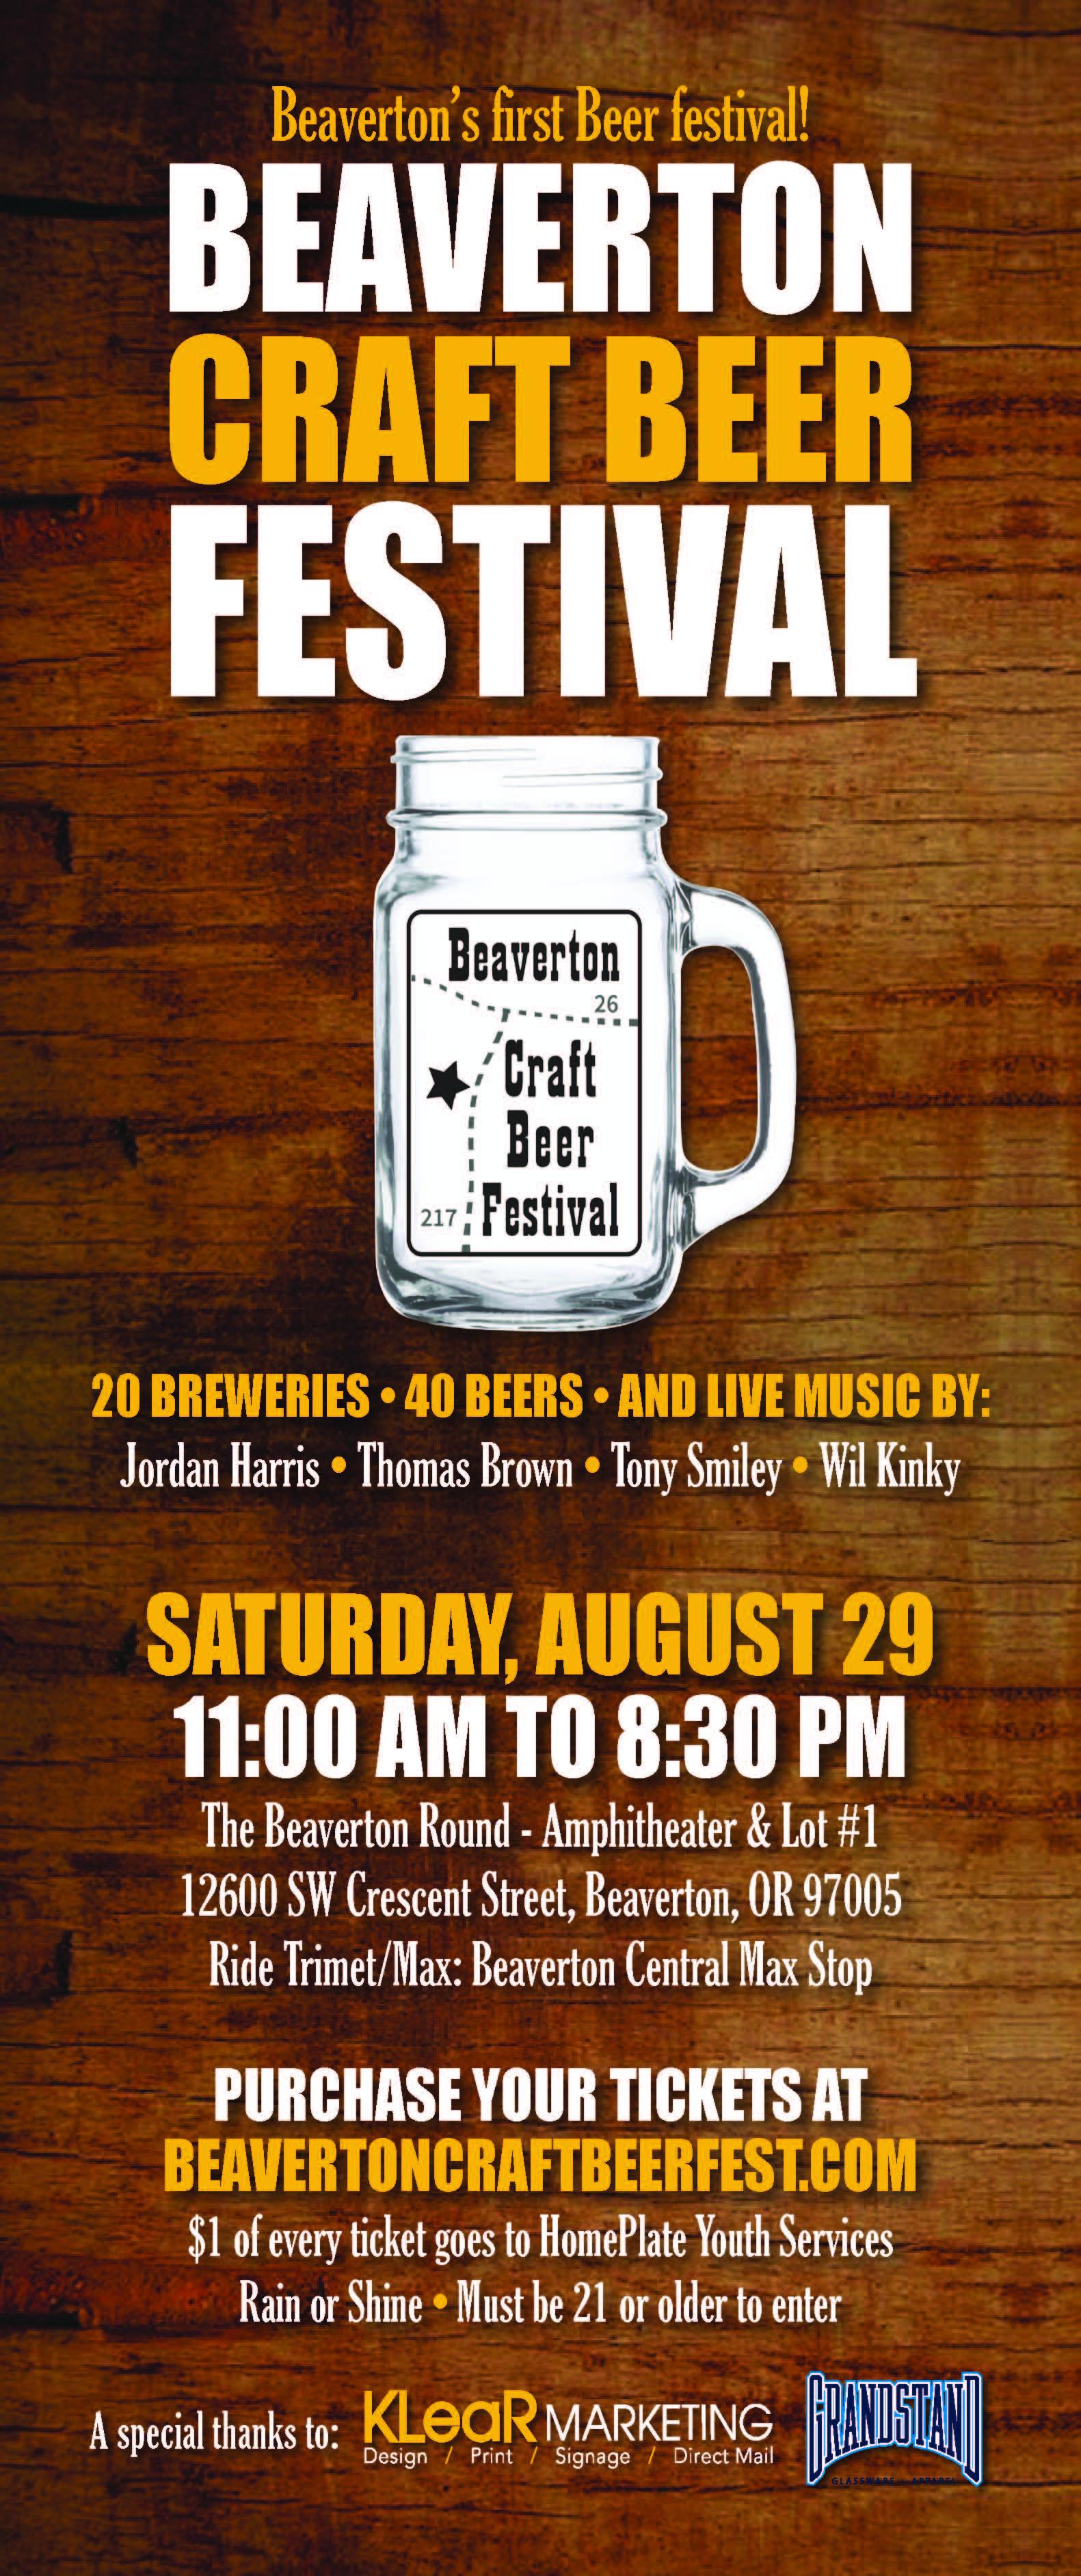 2015 Beaverton Craft Beer Festival Poster